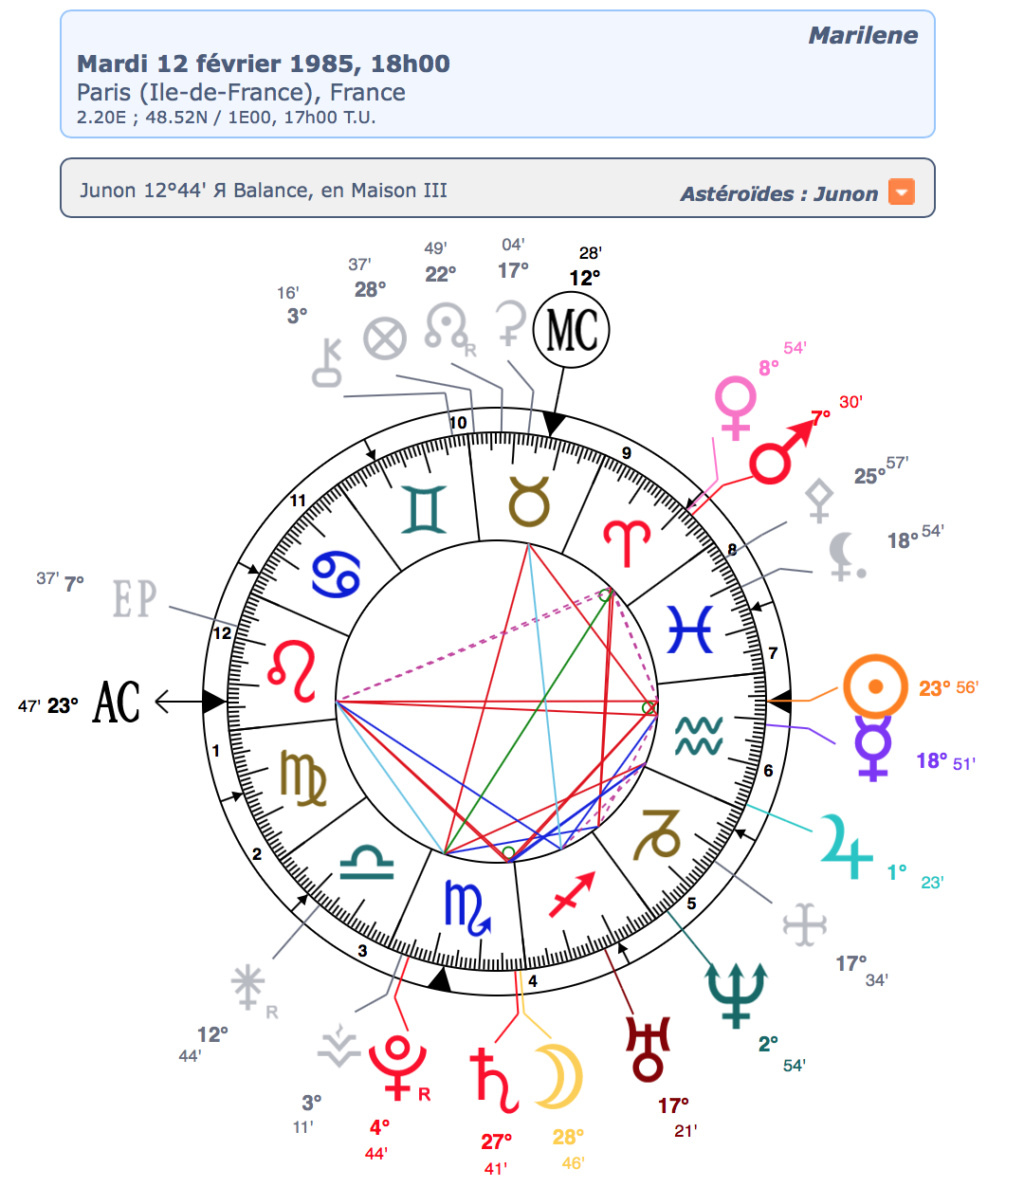 Confinement-Saturne/Jupiter M6 verseau Marile11